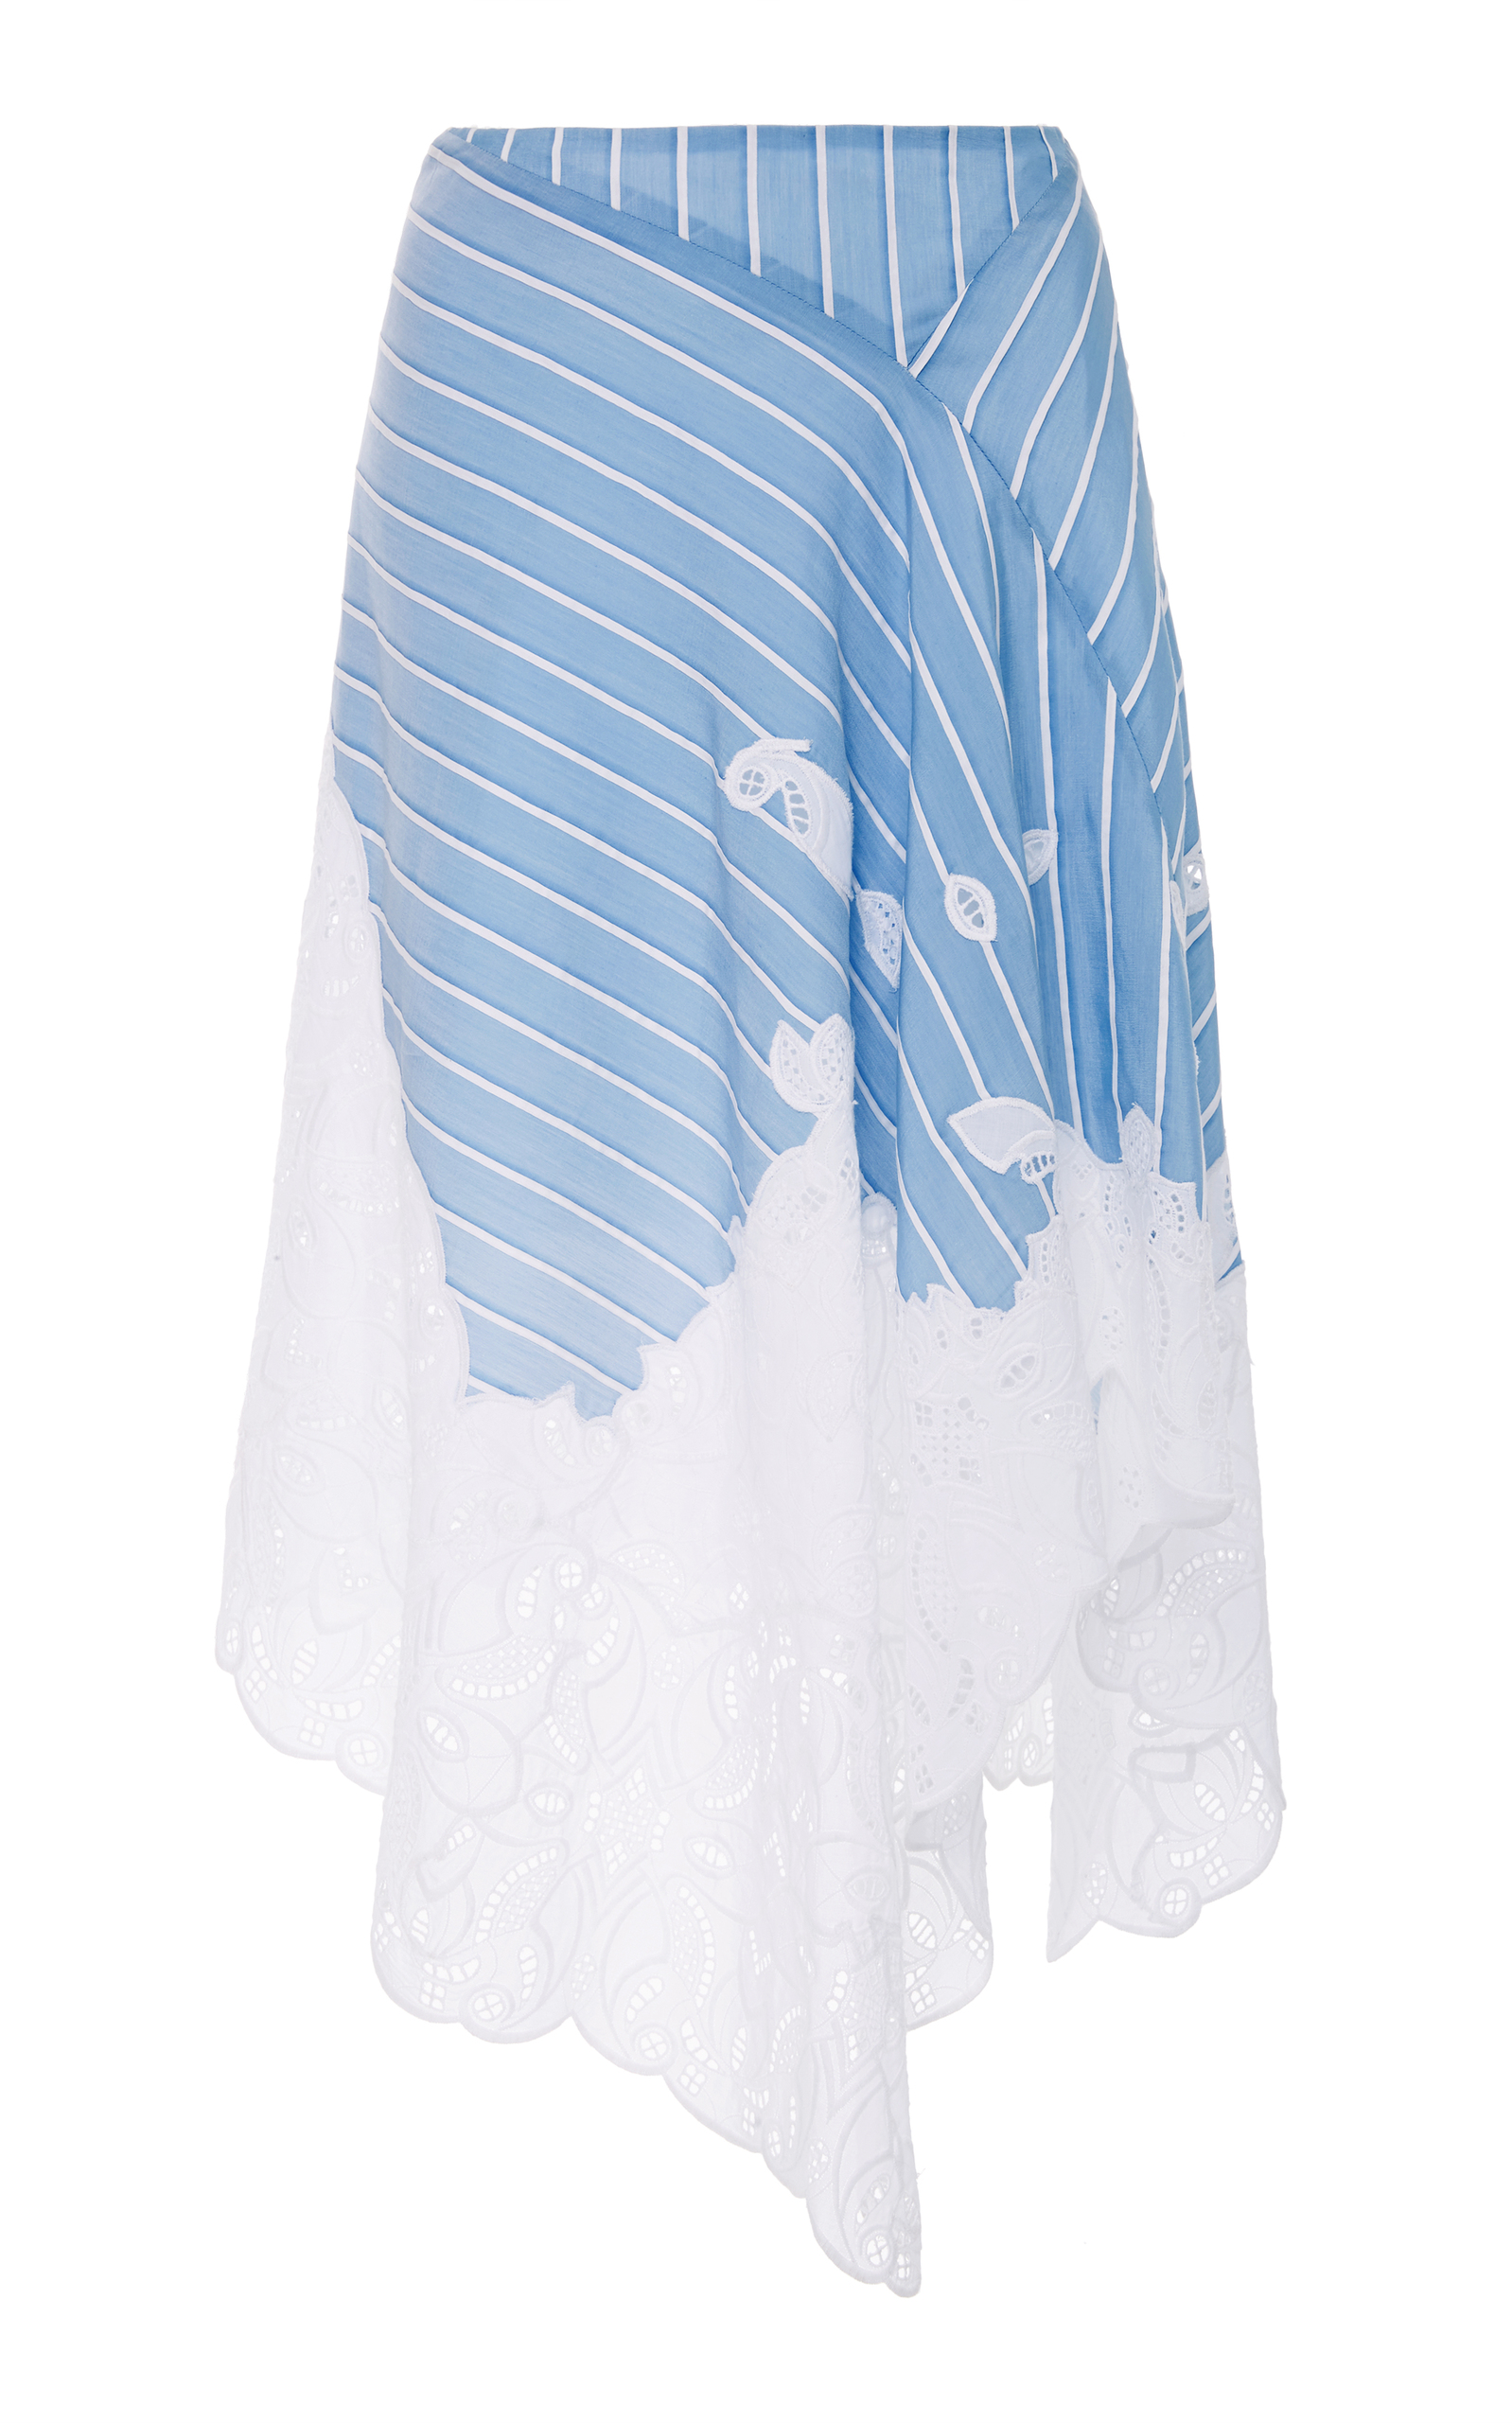 Striped cotton and silk-blend dress Jonathan Simkhai Hn6QN8